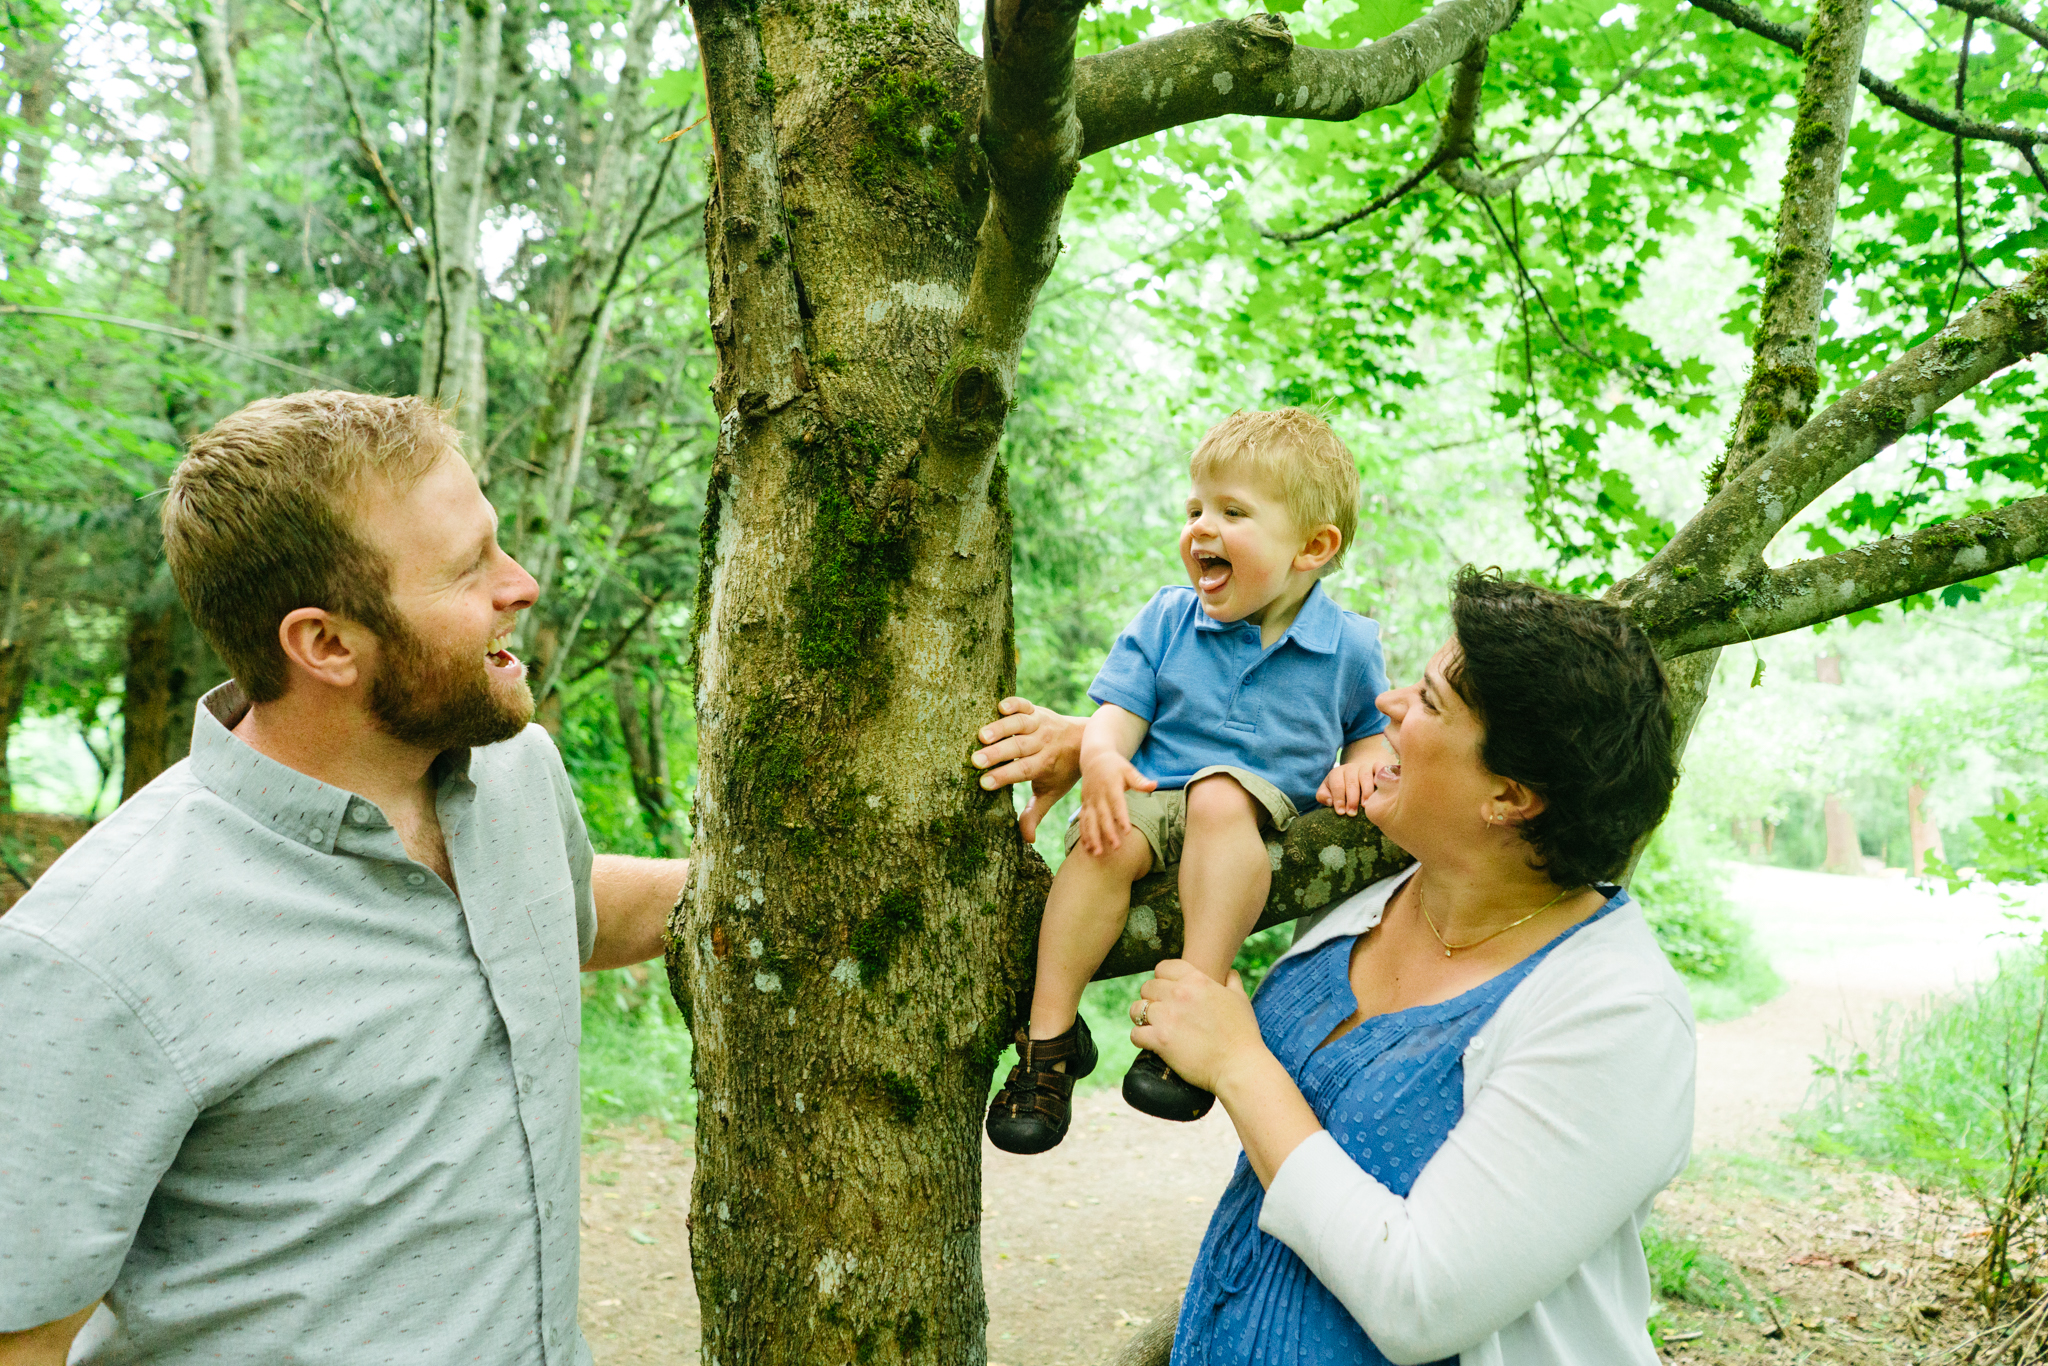 Family Photography at Clark Lake Park in Kent, Washington